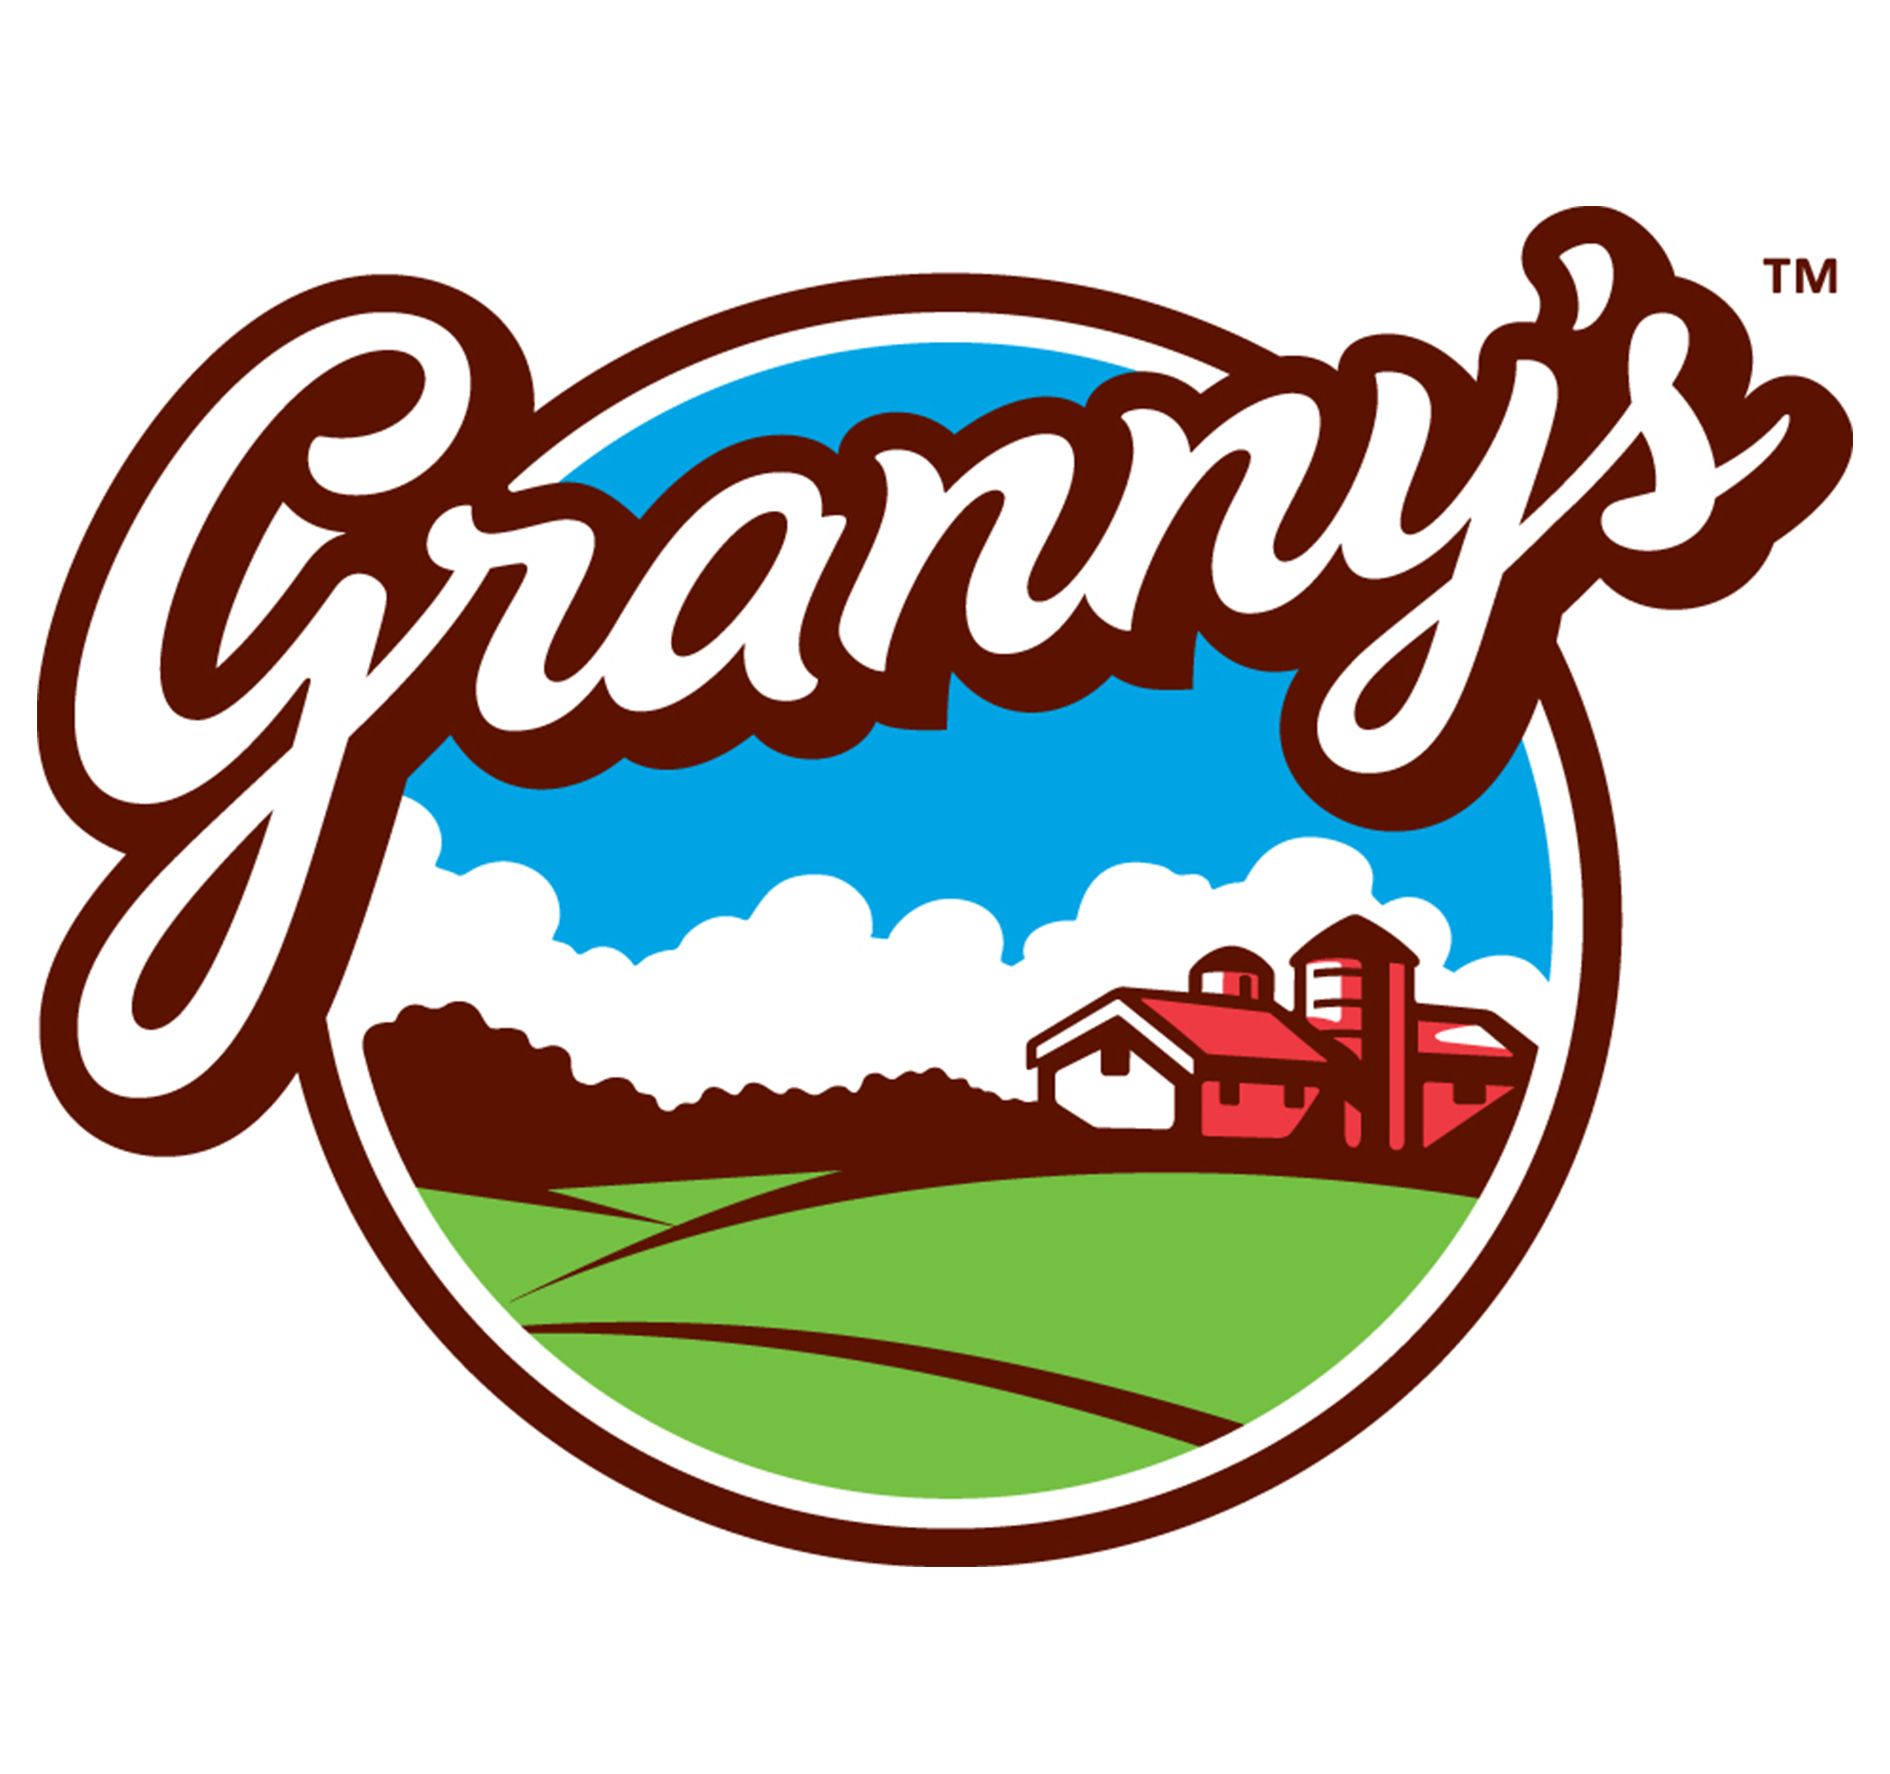 Logo Grannys